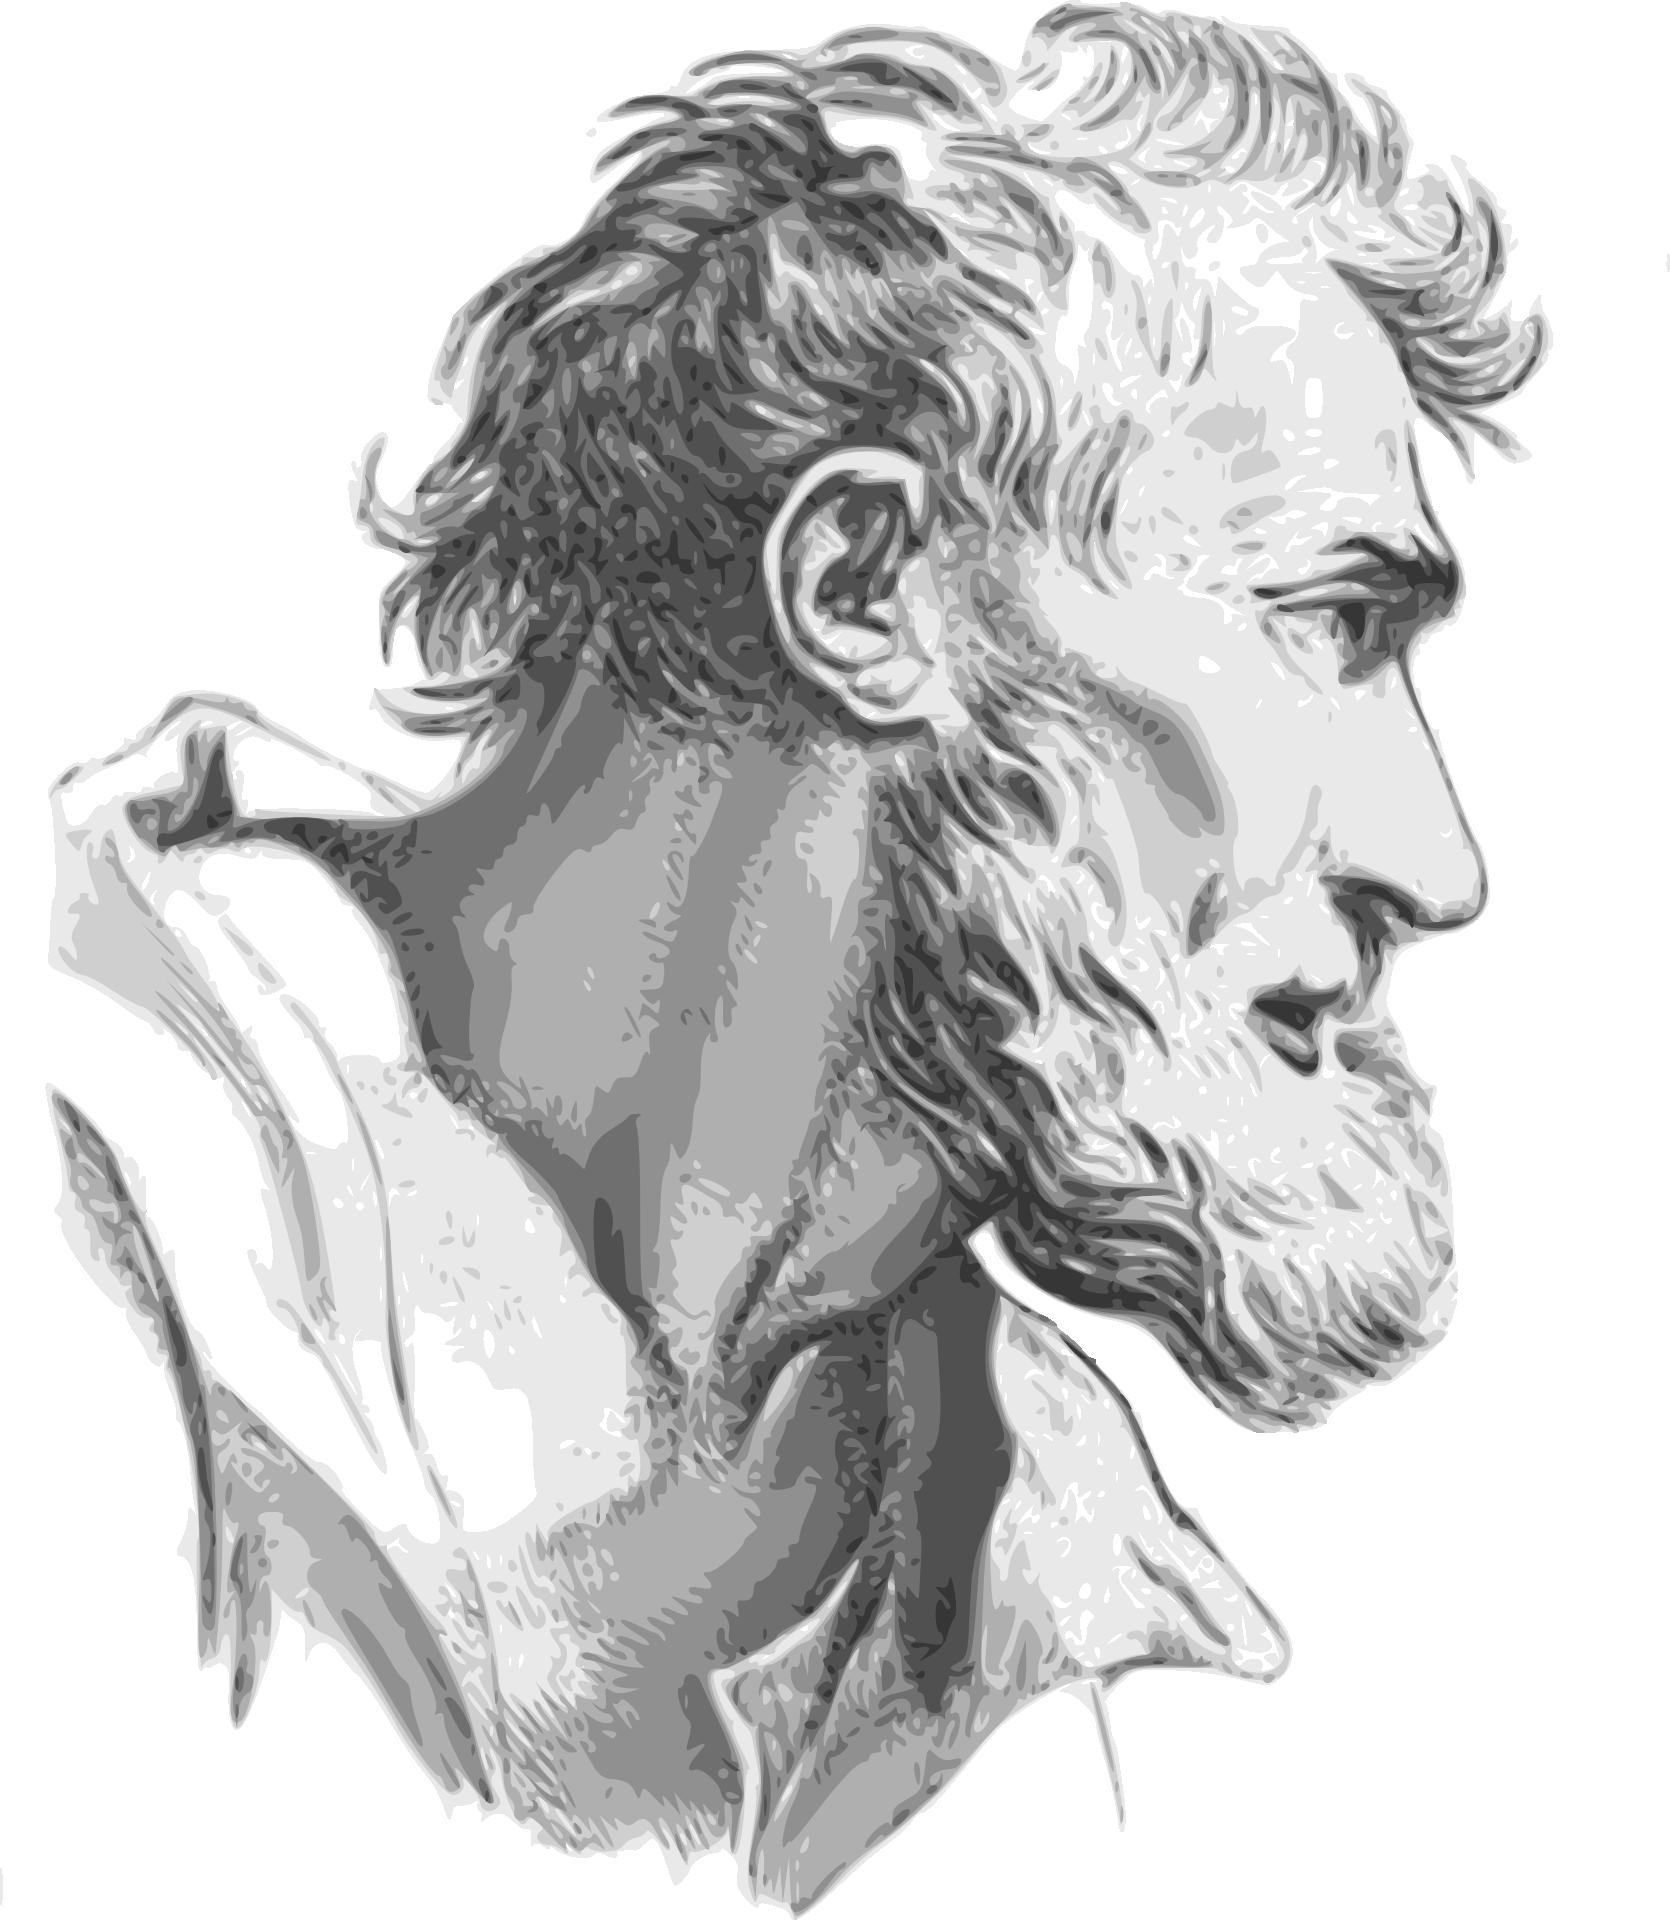 Bearded Man Drawing Pencil Free Image